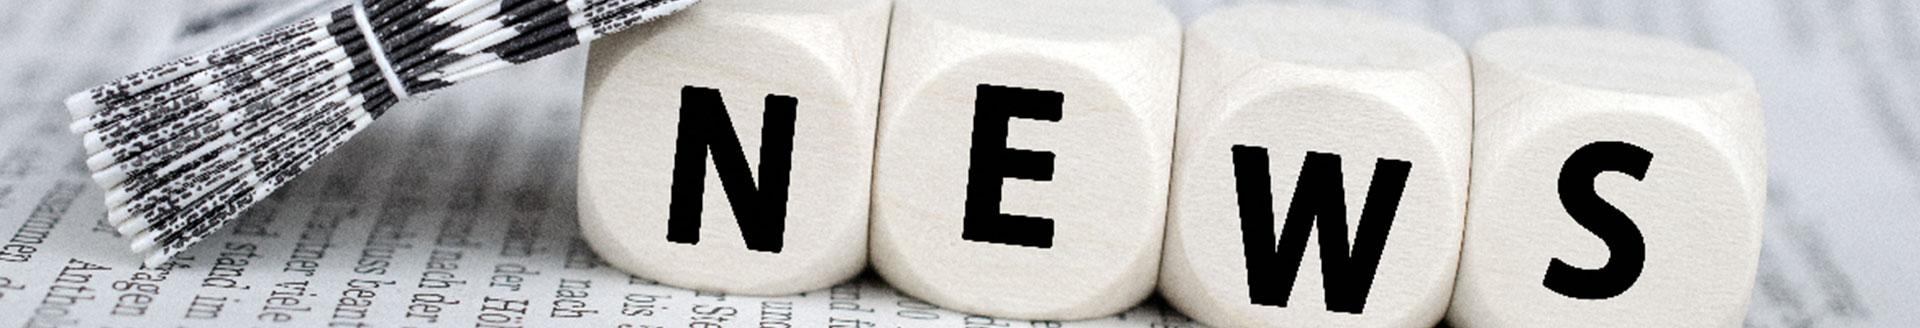 News & Tax Tips - Breedlove & Co., P.C.